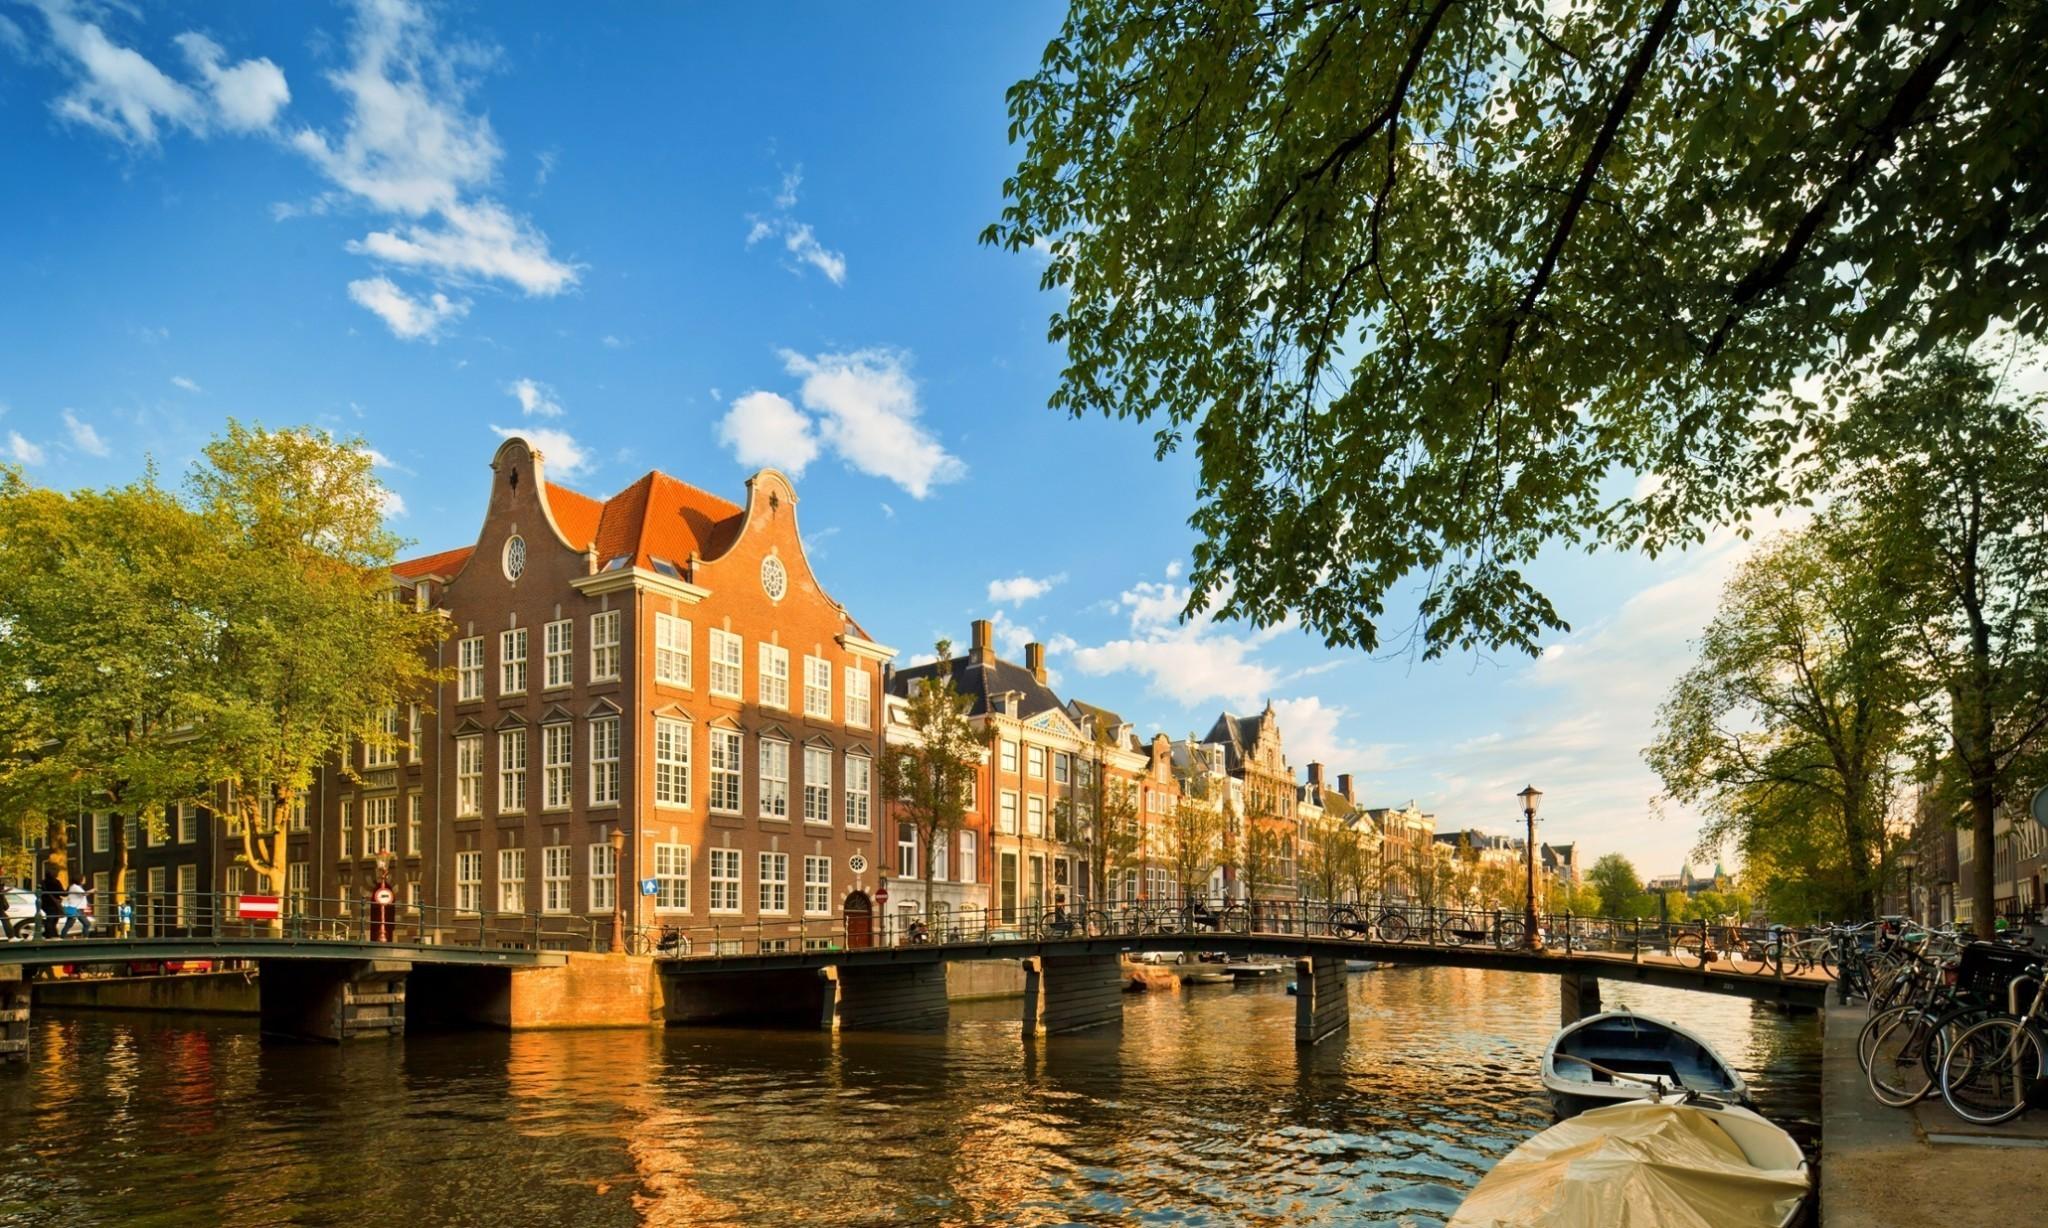 10 steps to building a smart city